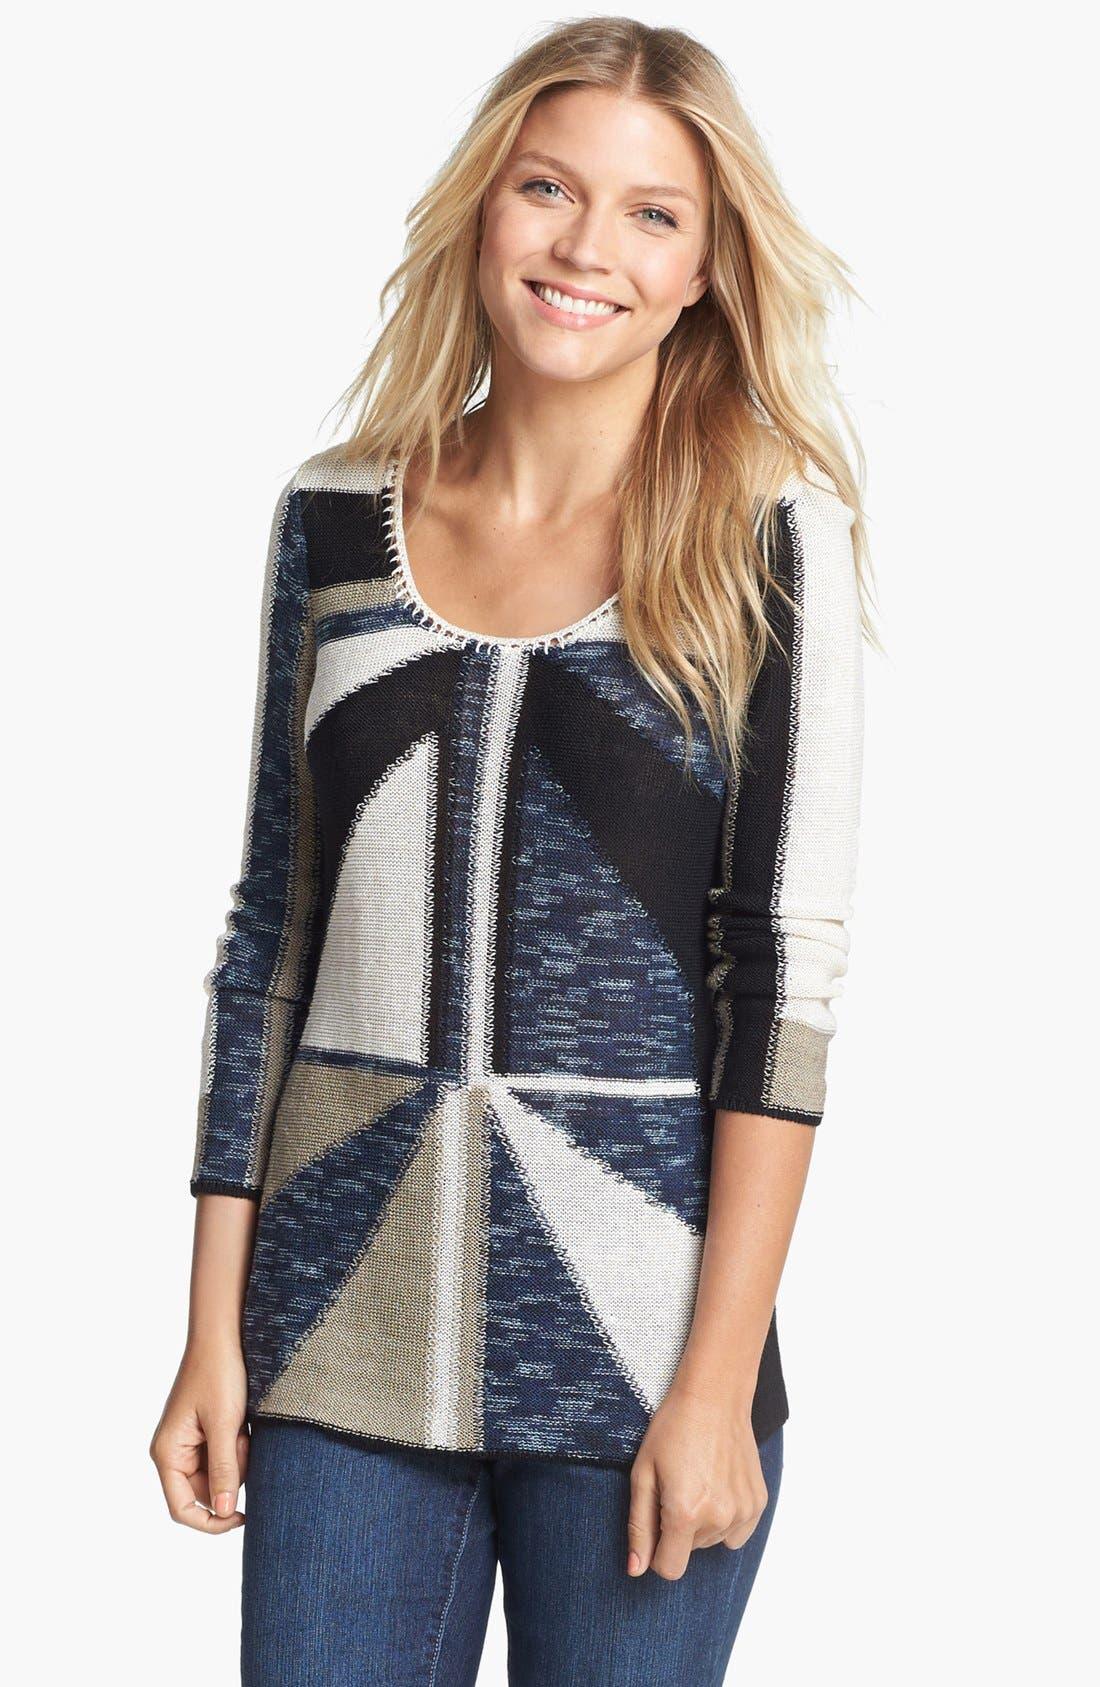 Alternate Image 1 Selected - NIC+ZOE 'Triangle' Sweater